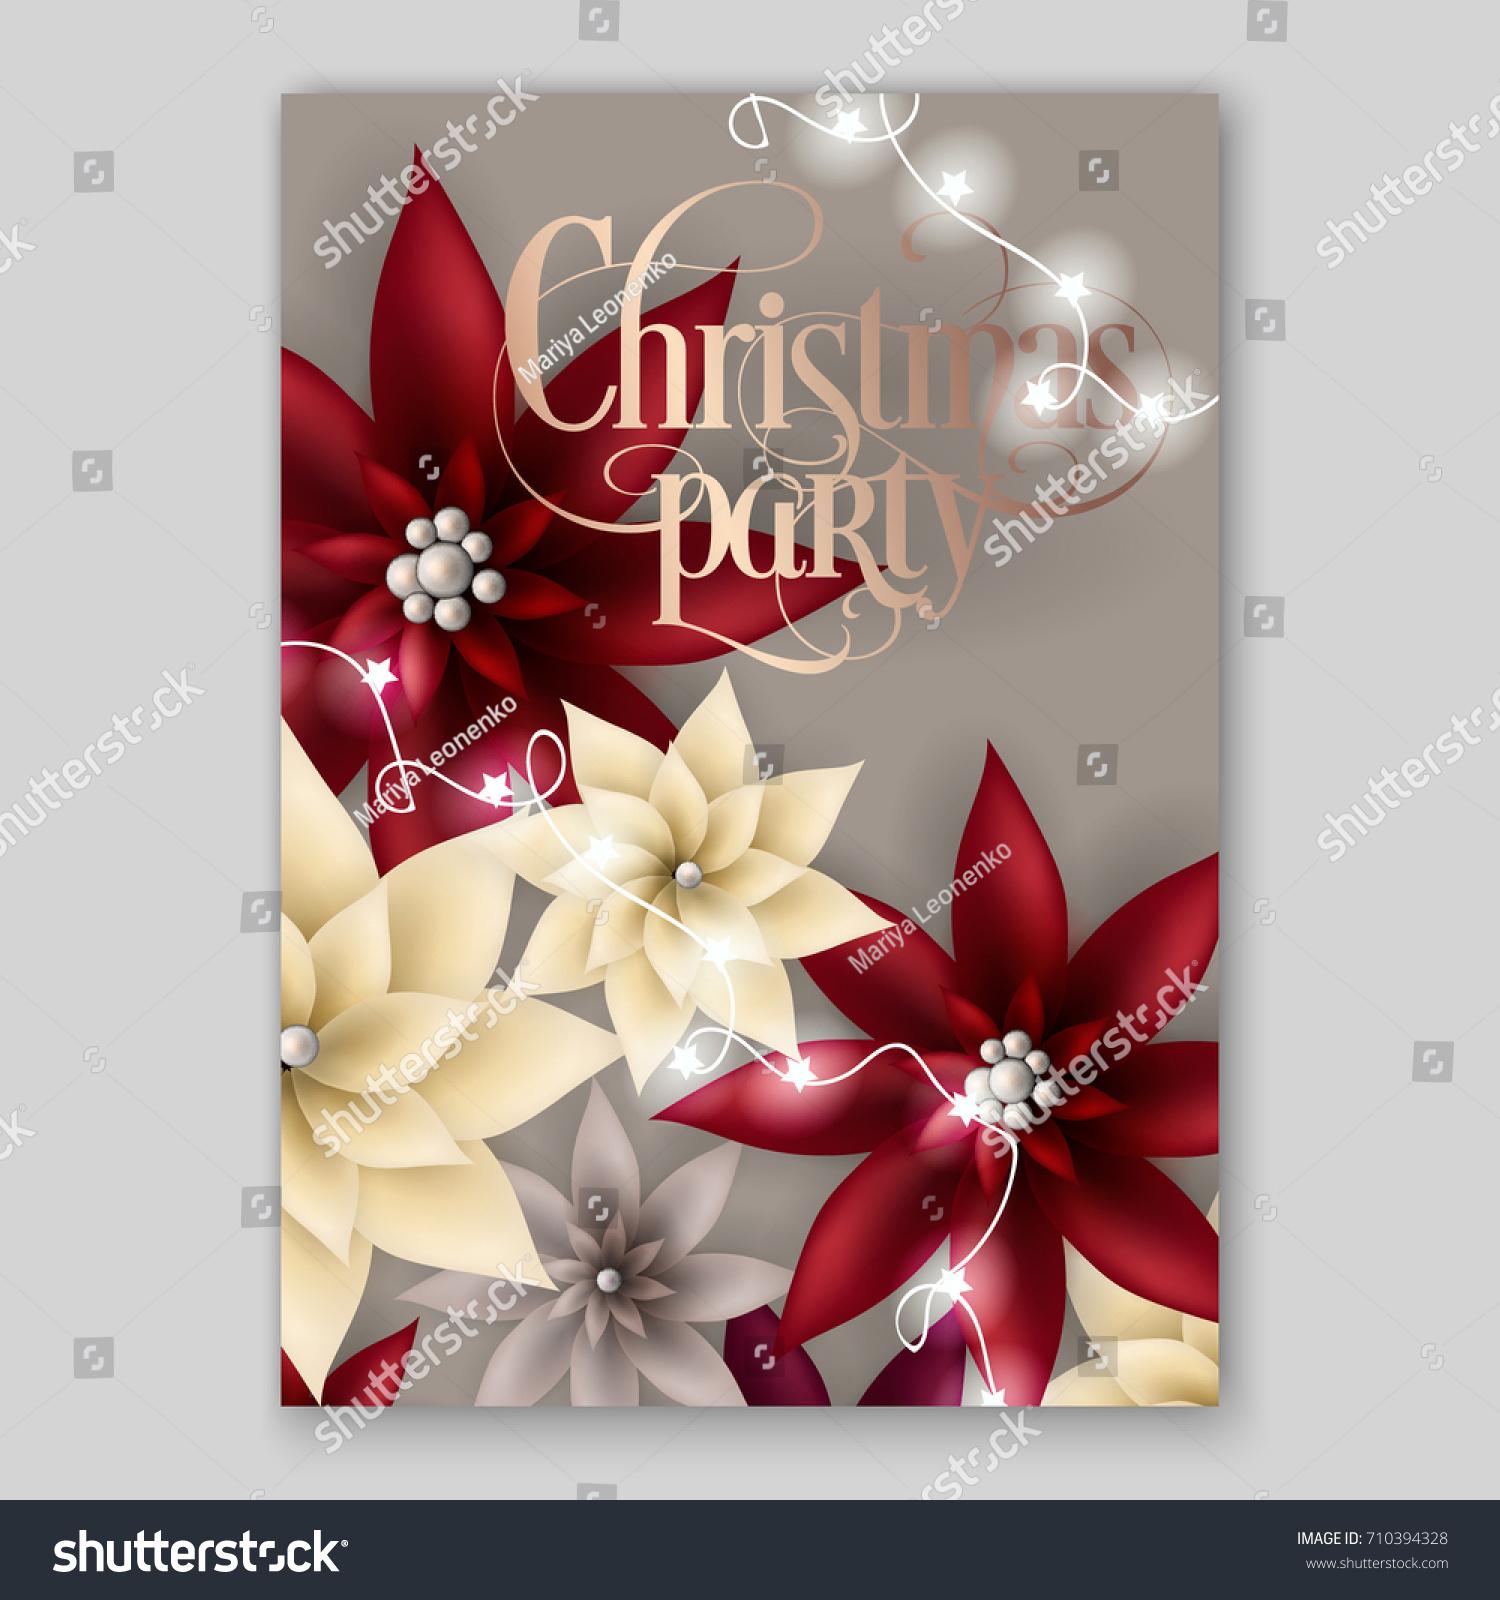 Christmas Party Invitation Big Paper Vector Stock Vector Royalty